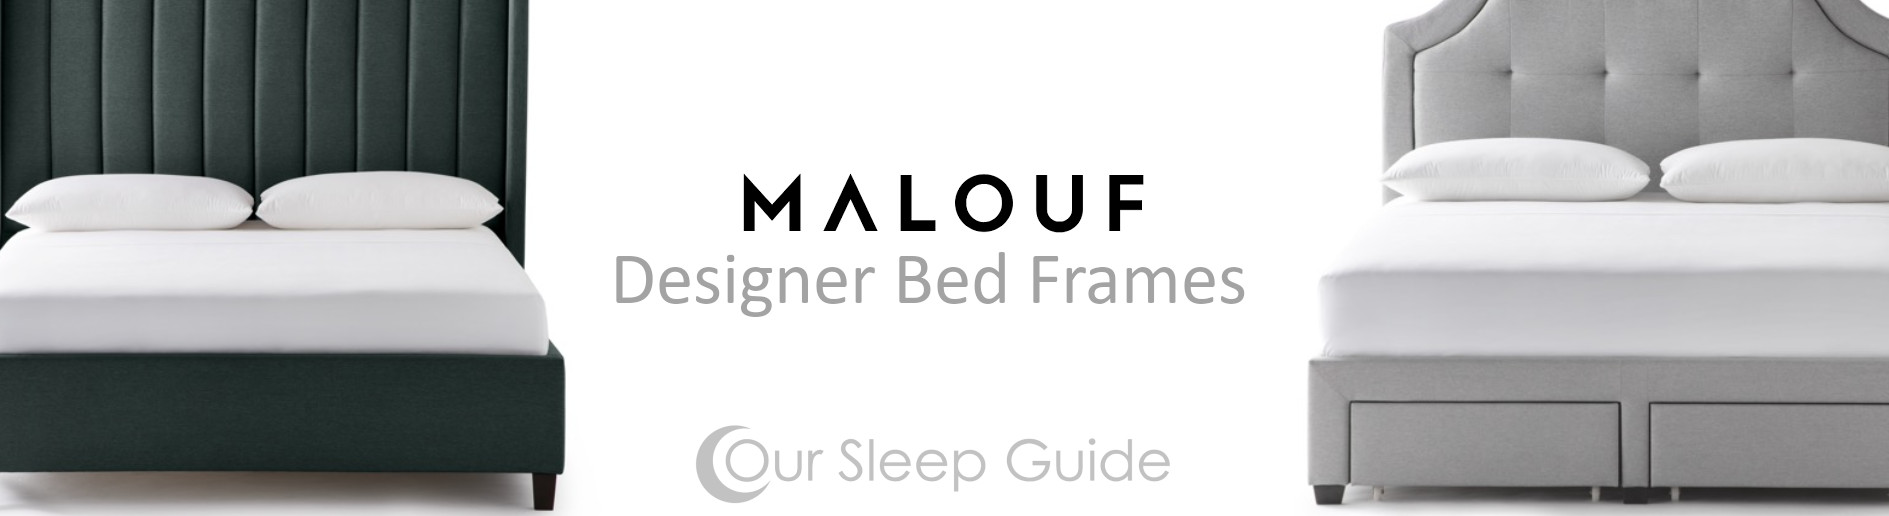 Malouf Designer Beds